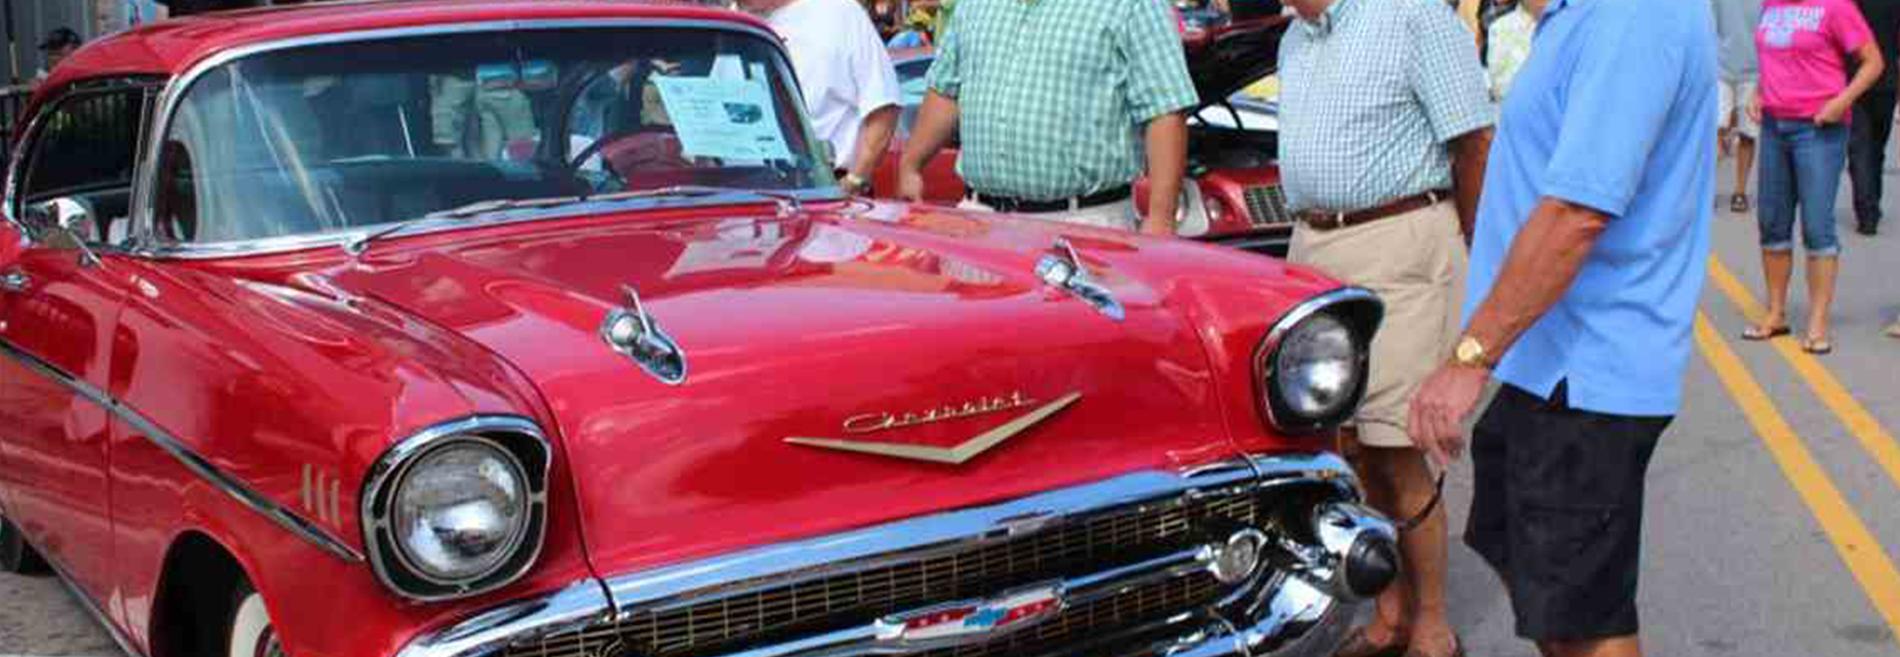 Cruise-in Car Show